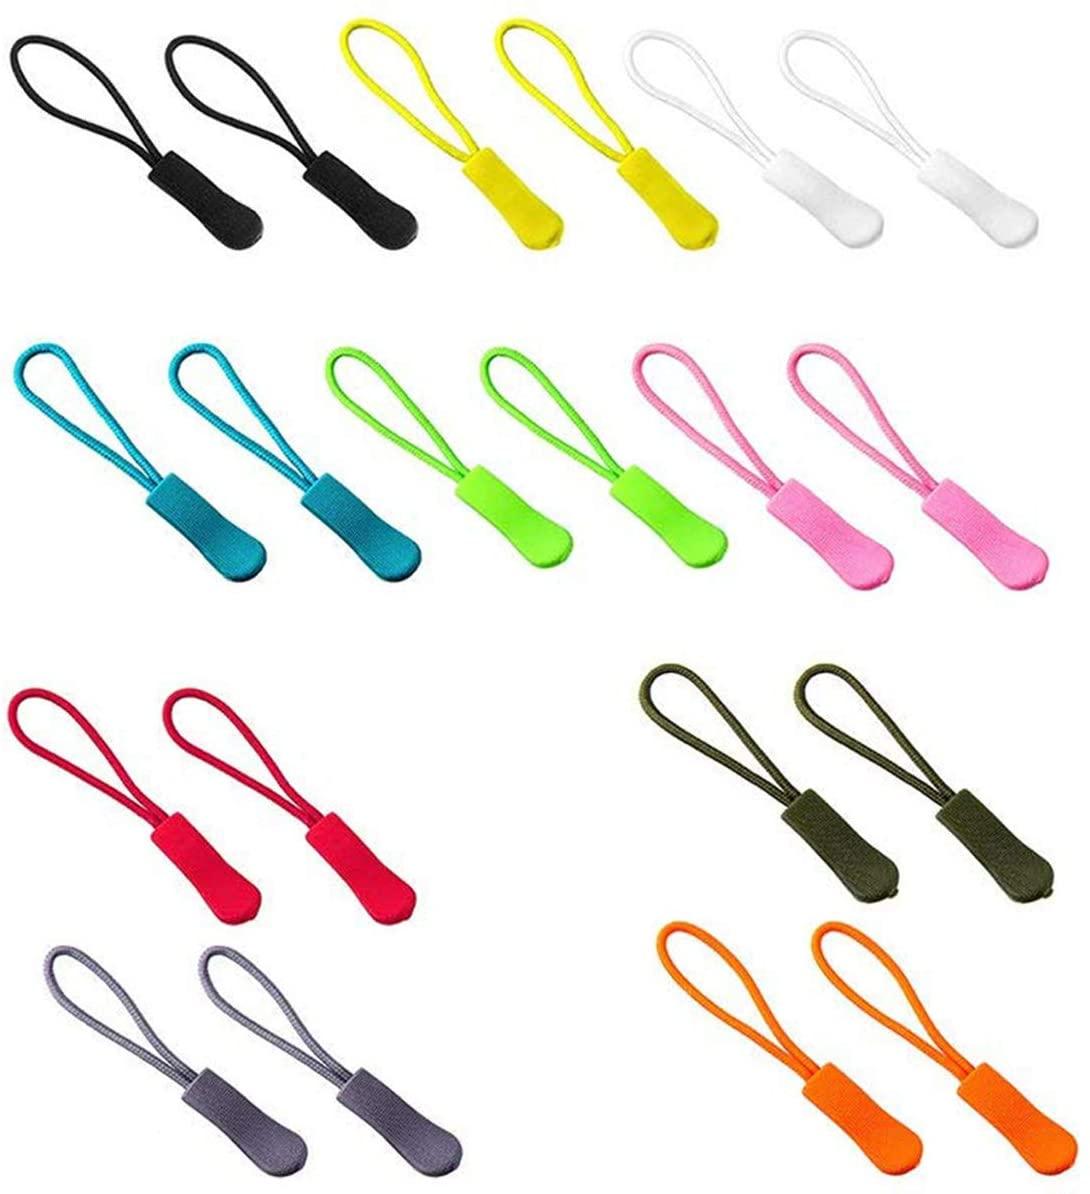 BOROLA 20pcs Zipper Pulls PVC Nylon Cord Zipper Tab for Backpacks, Jackets, Luggage, Purses, Handbags (10 Colors)